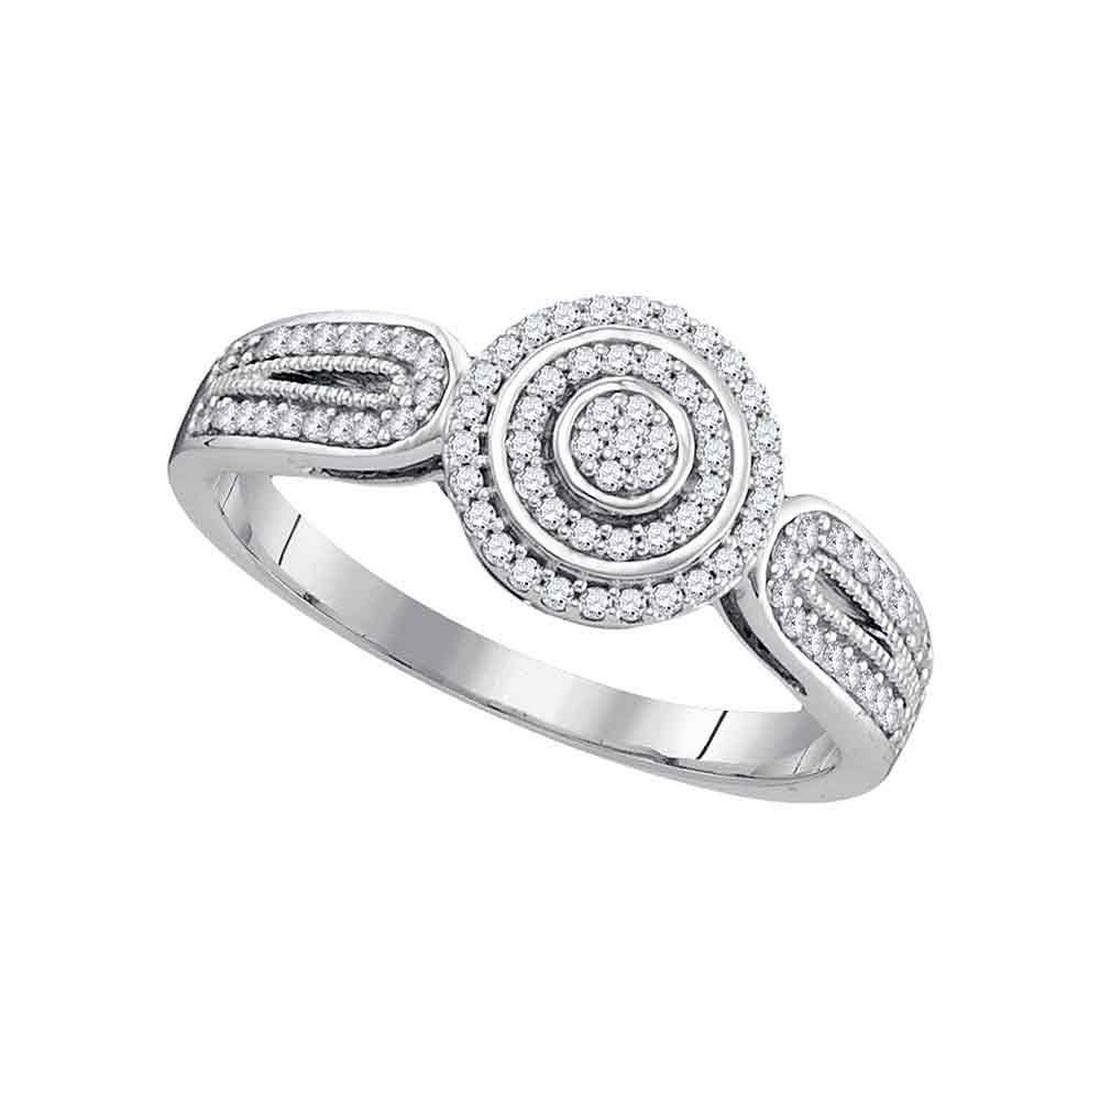 85d90759af177 Diamond Circle Cluster Bridal Wedding Engagement Ring - Aug 03, 2019 ...